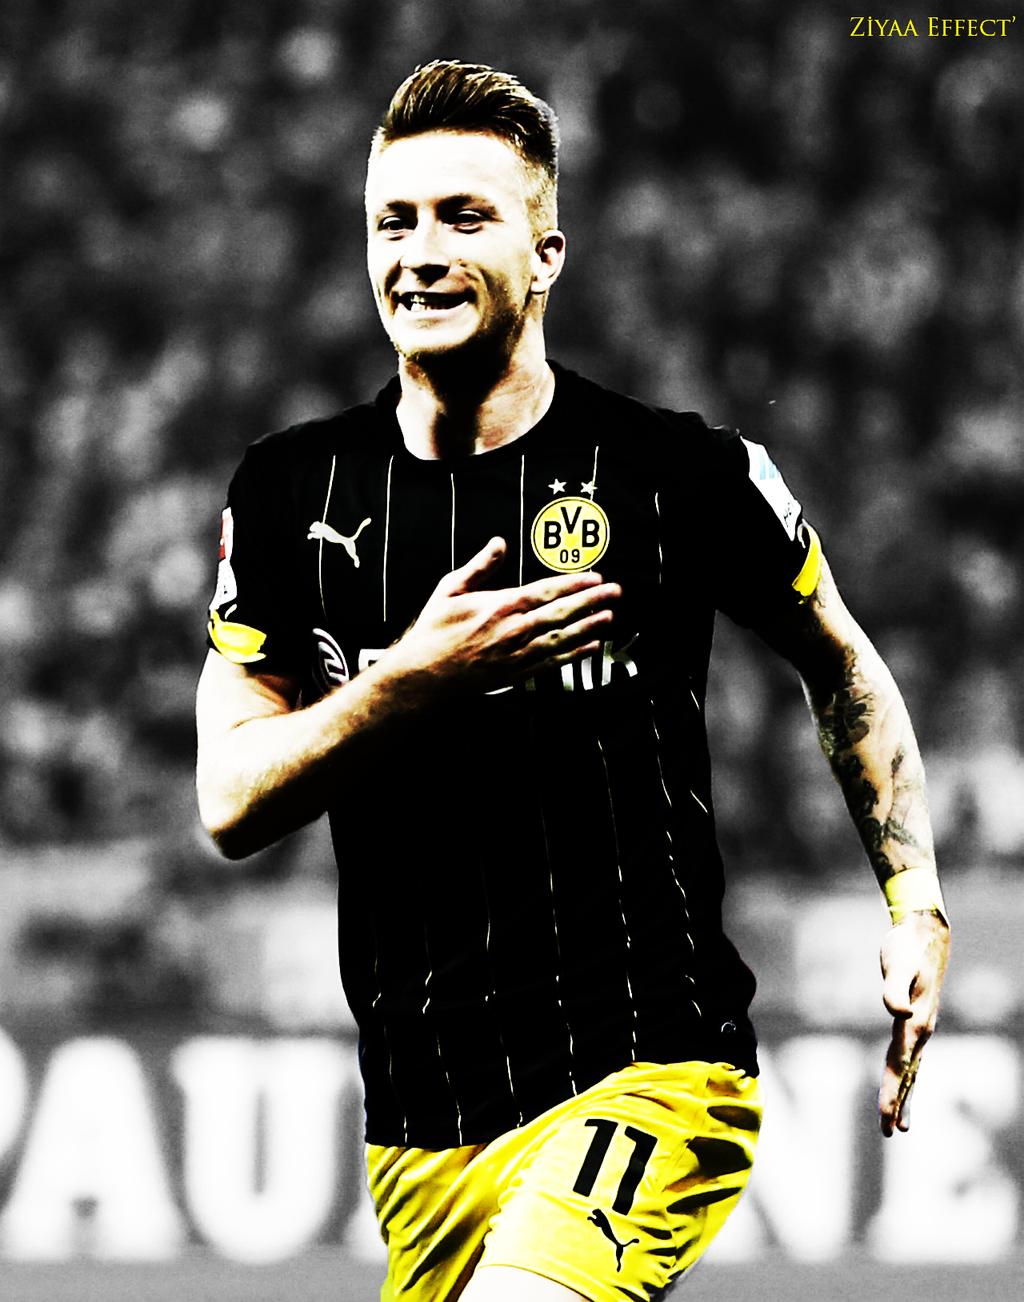 Marco Reus Borussia Dortmund by ZiyaaEffect on DeviantArt